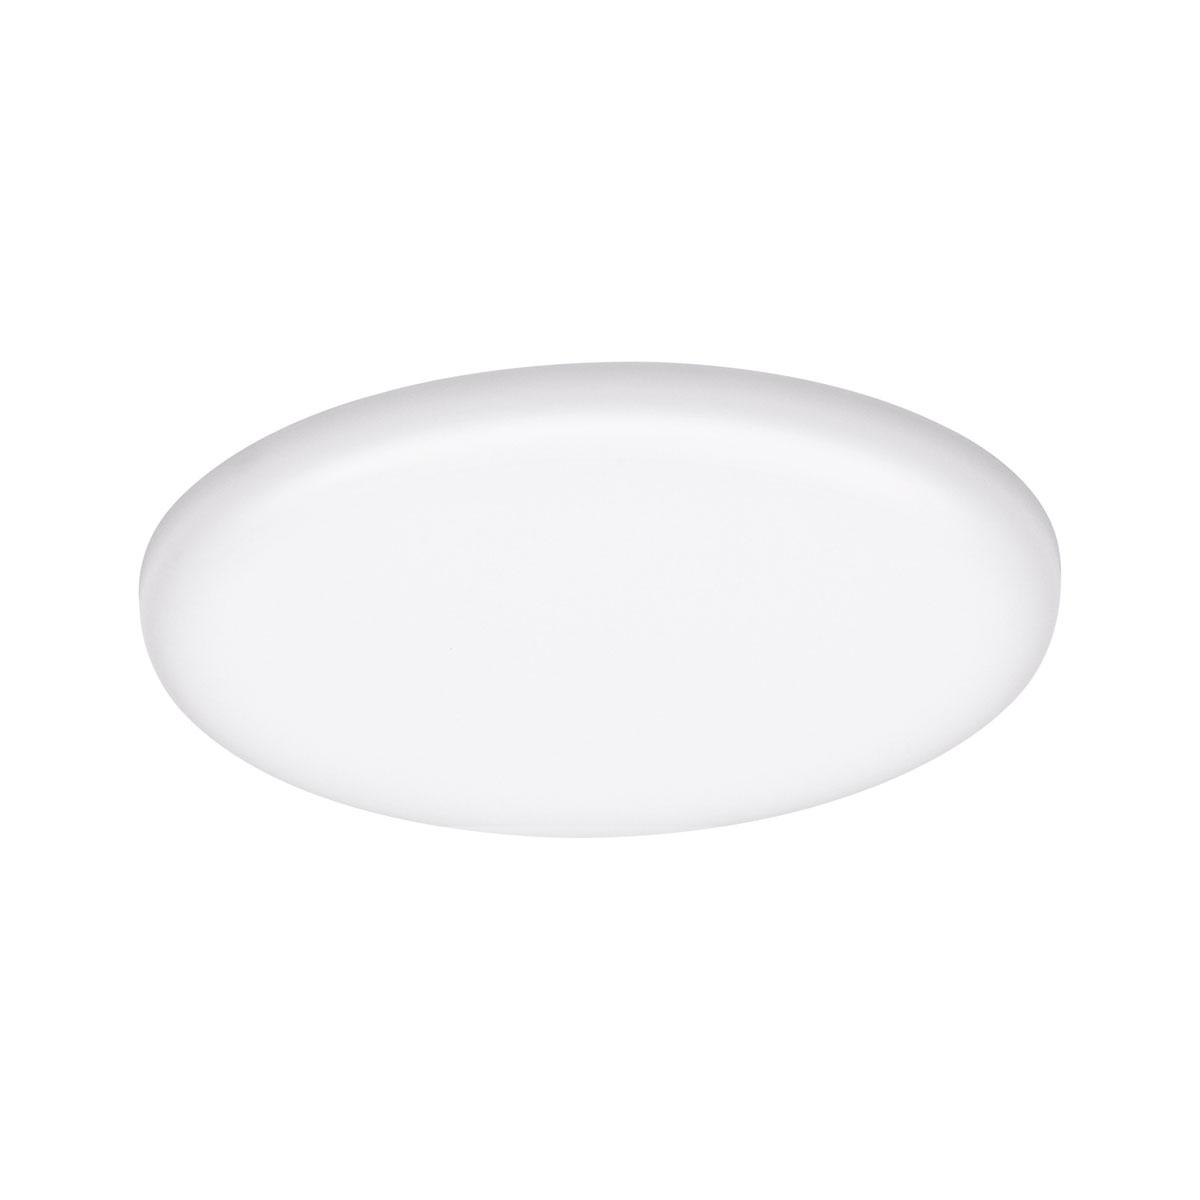 "LED-Deckenleuchte ""Veluna VariFit"", Ø12,5cm, 4000K, weiß 4000 k | 12,5 cm"